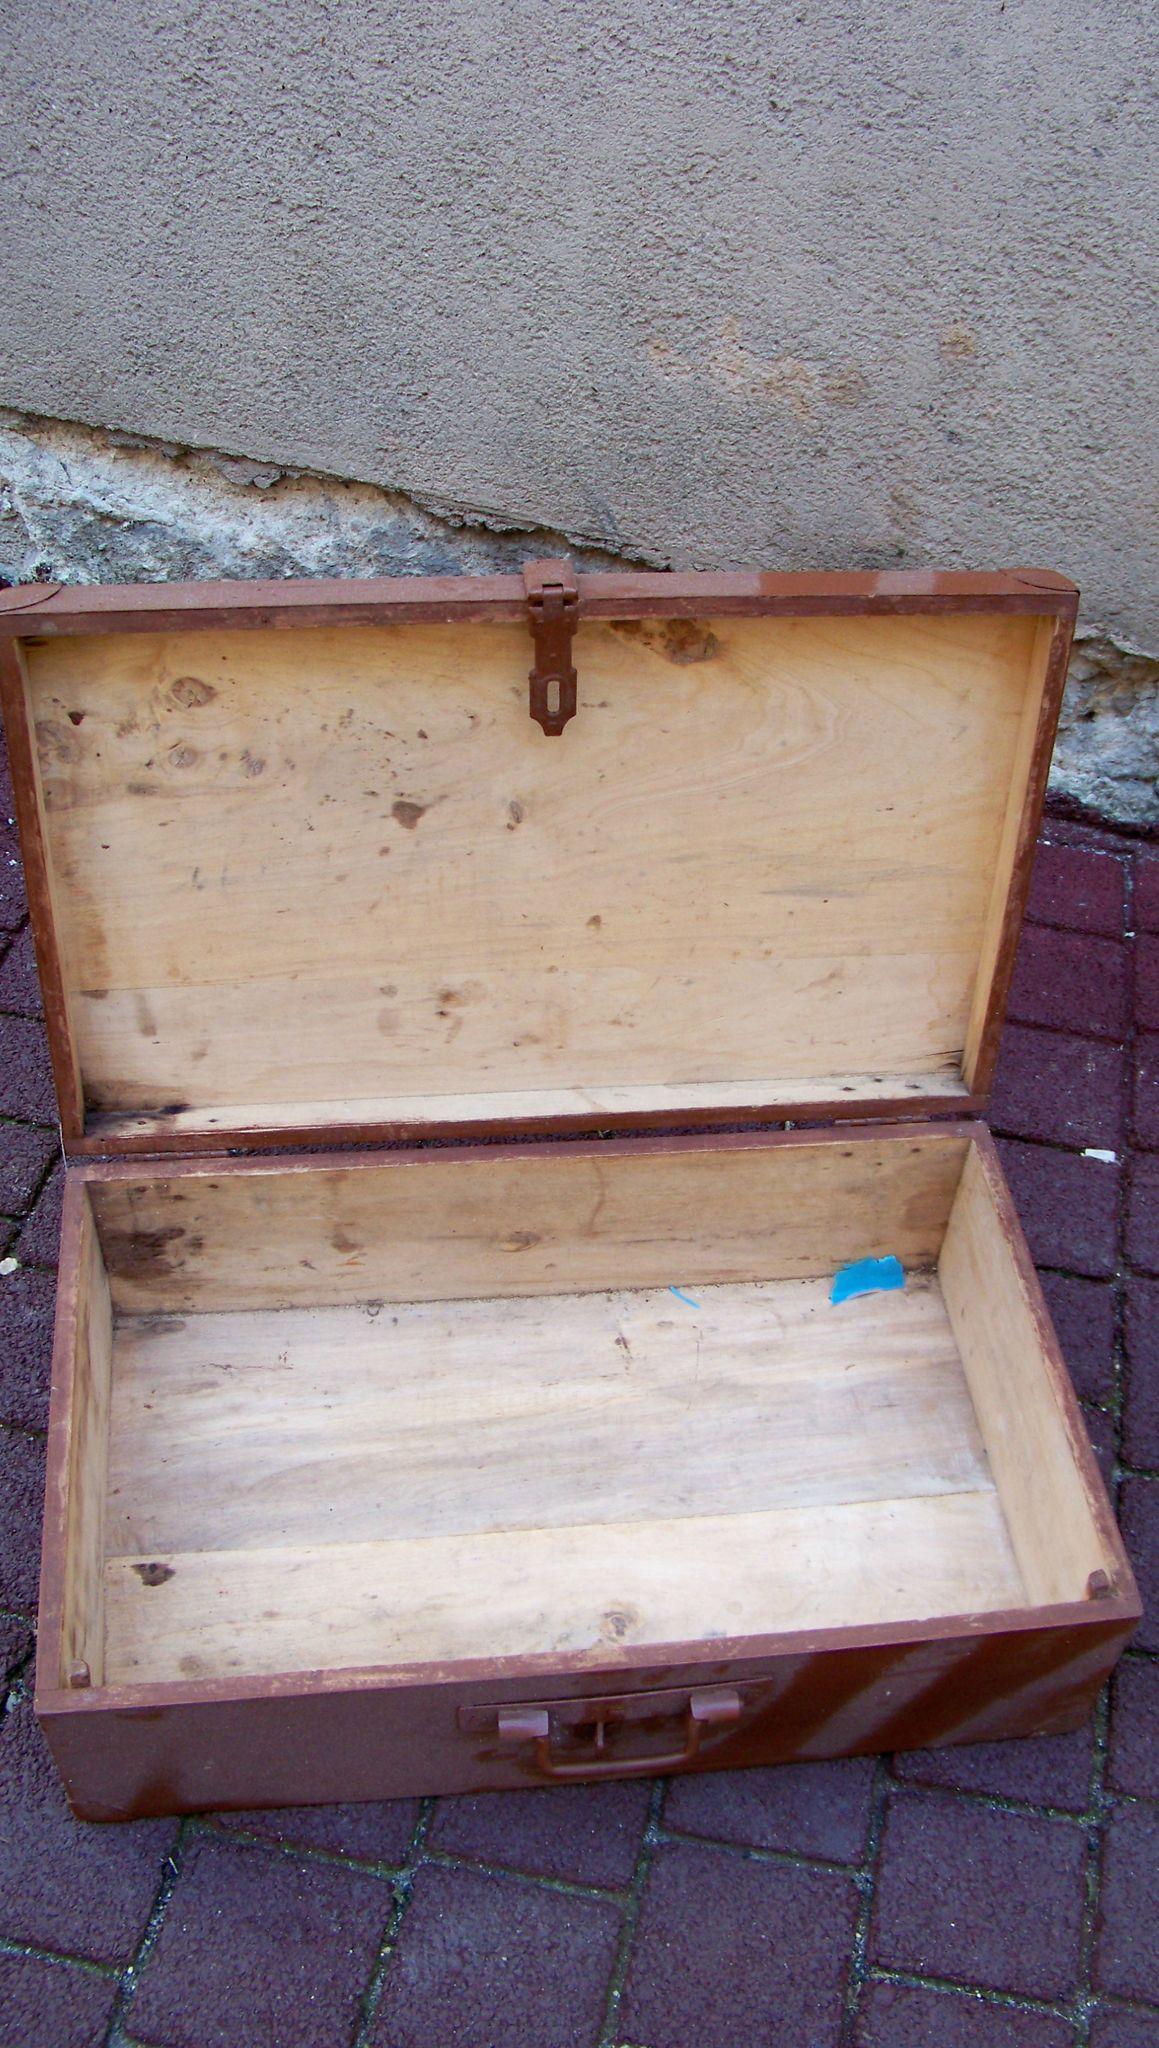 valise en bois la petite brocanteuse. Black Bedroom Furniture Sets. Home Design Ideas